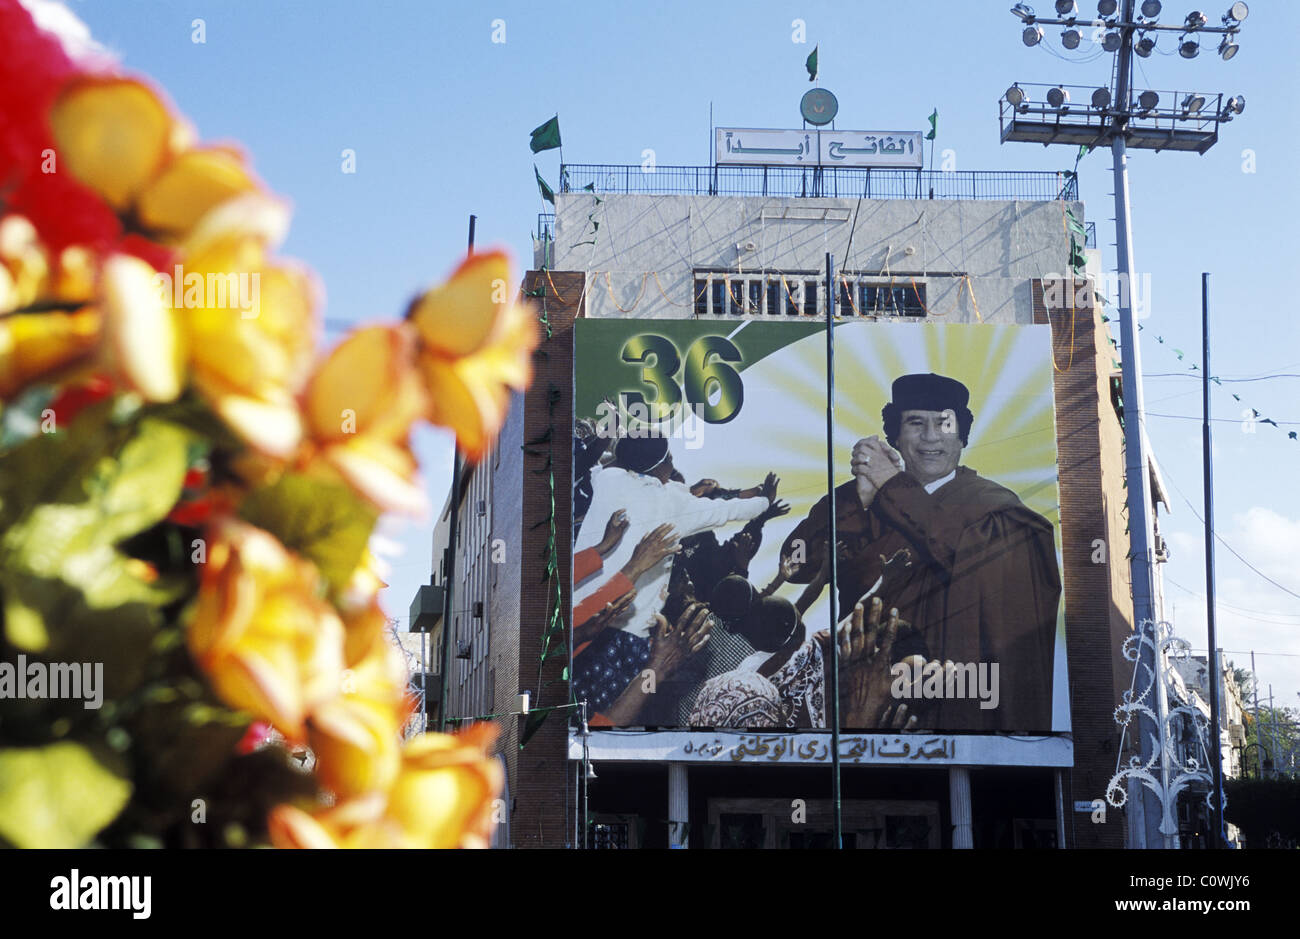 Sign with Muammar Abu Minyar al-Gaddafi, Mu'ammar Abu Minyar al-Qaddhafi at the Green Square in Tripoli, 35 years - Stock Image